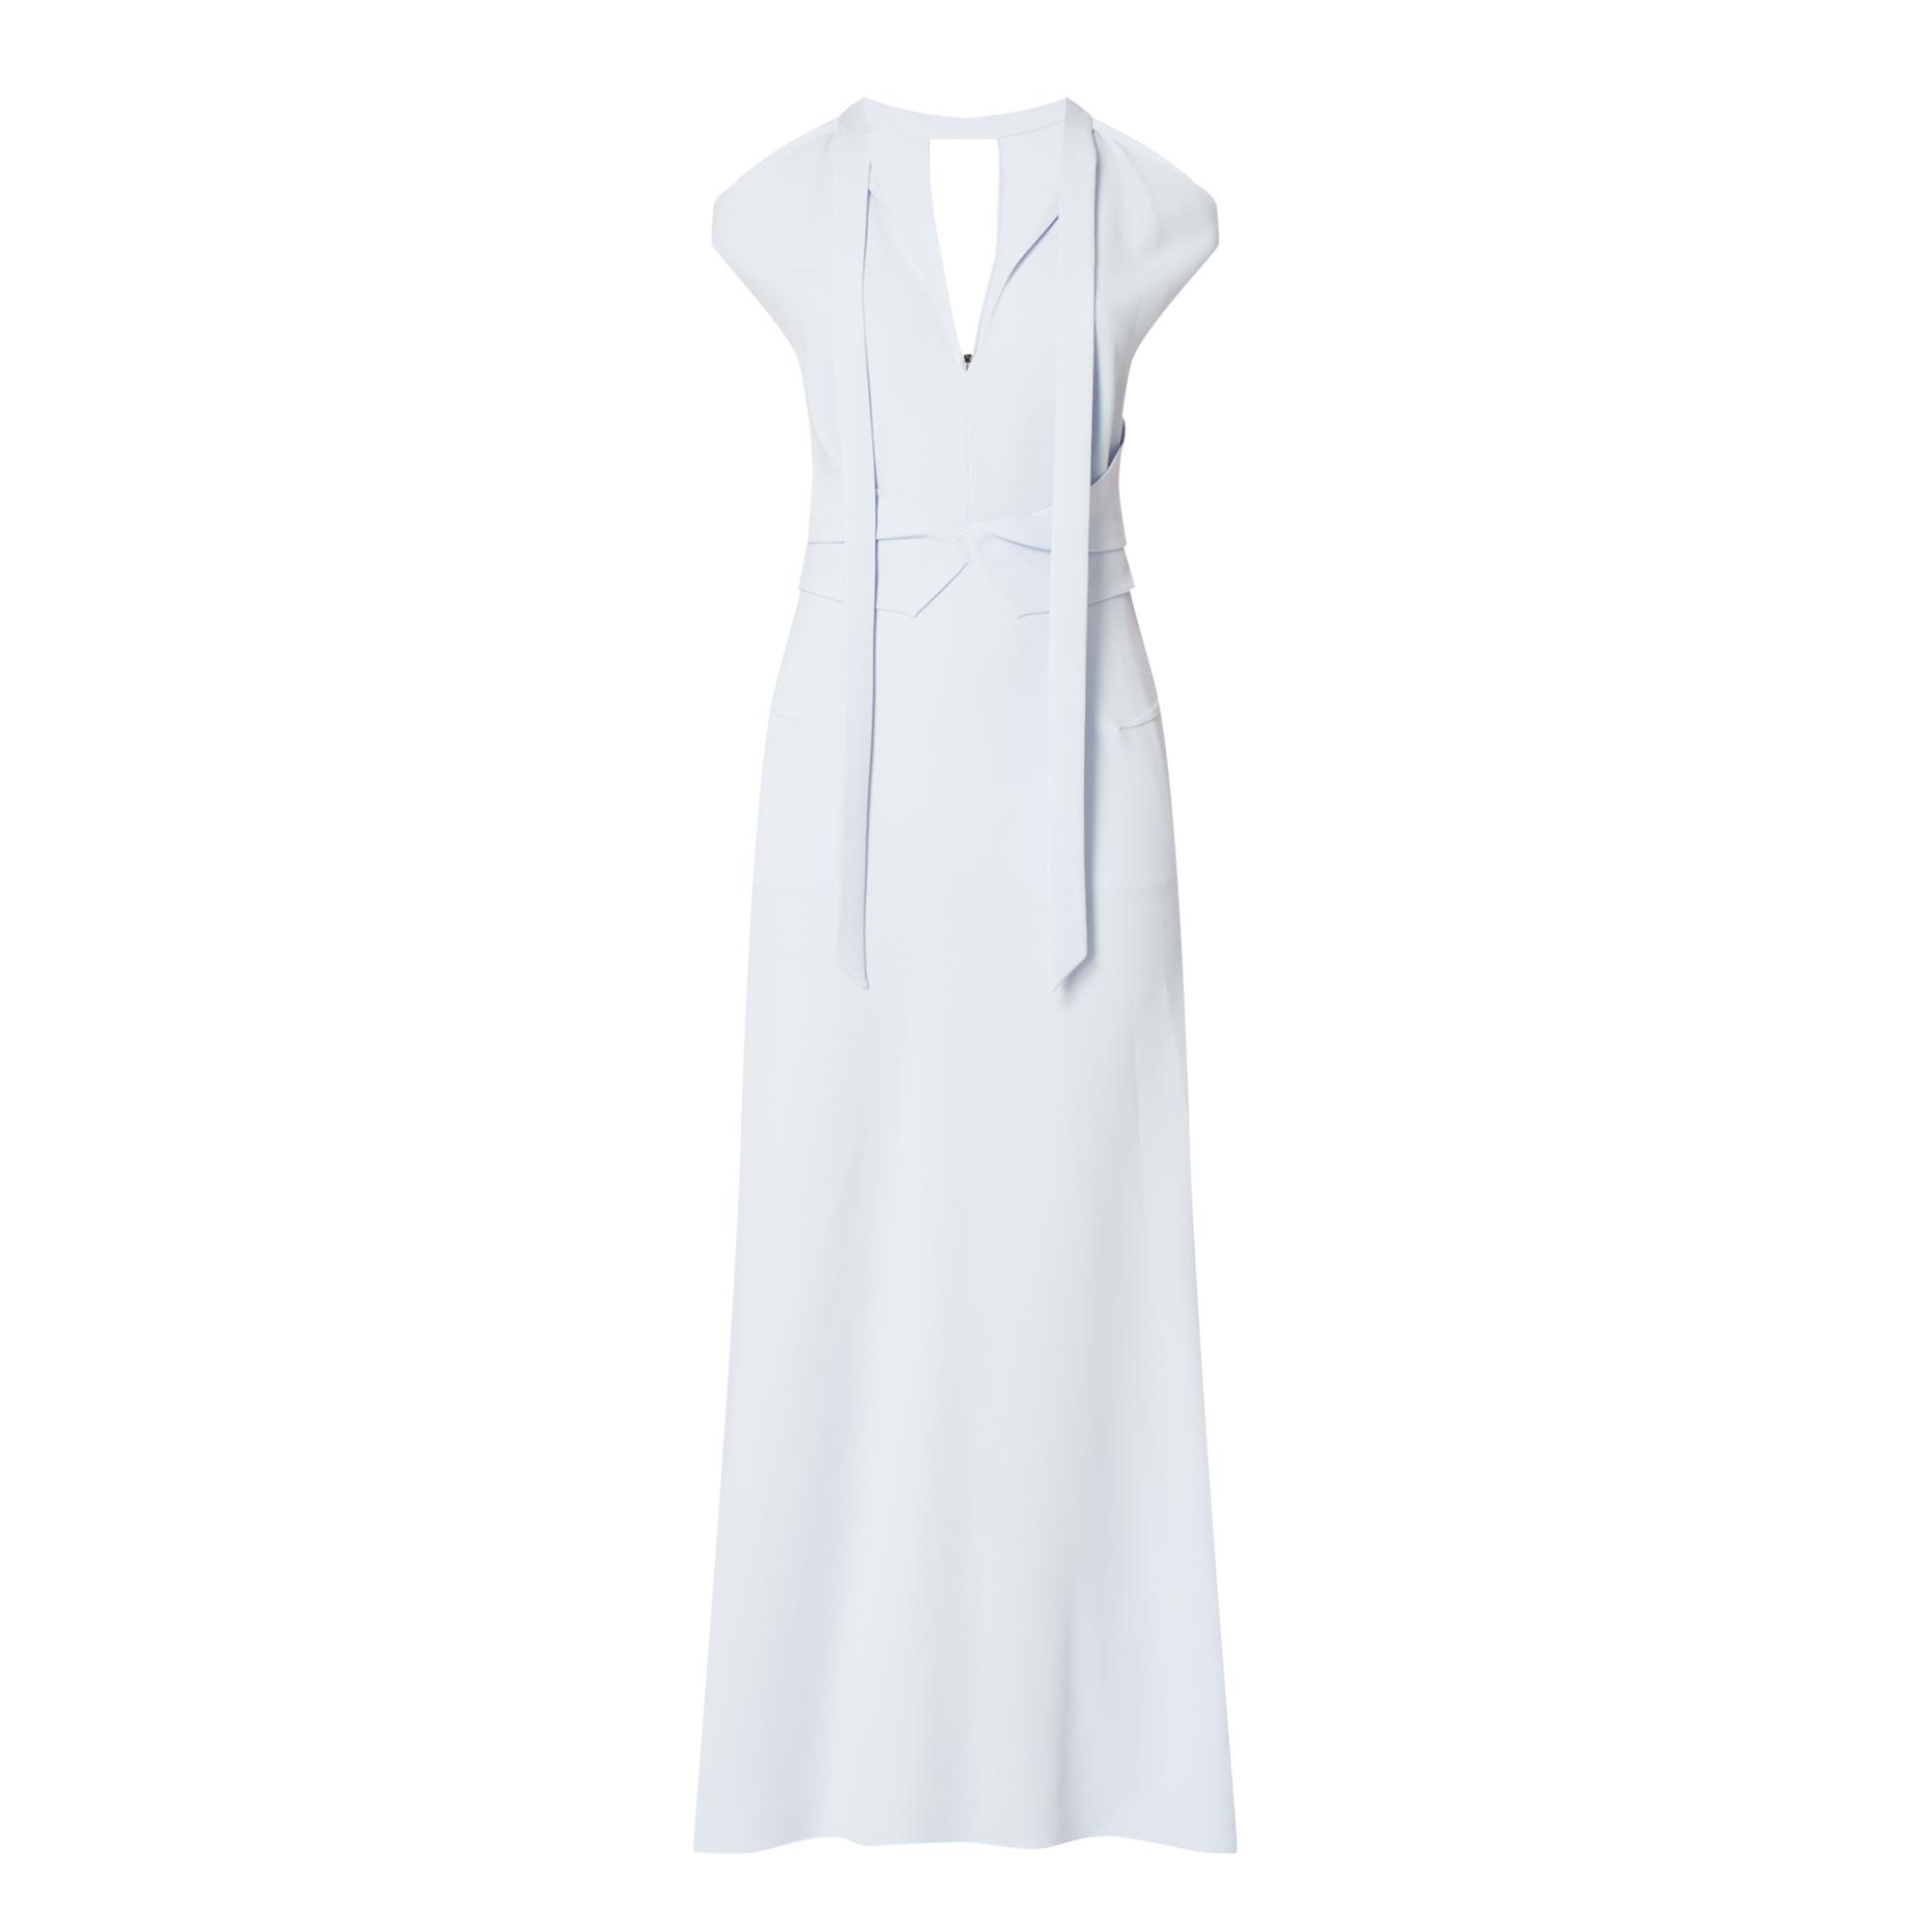 Katios Dress